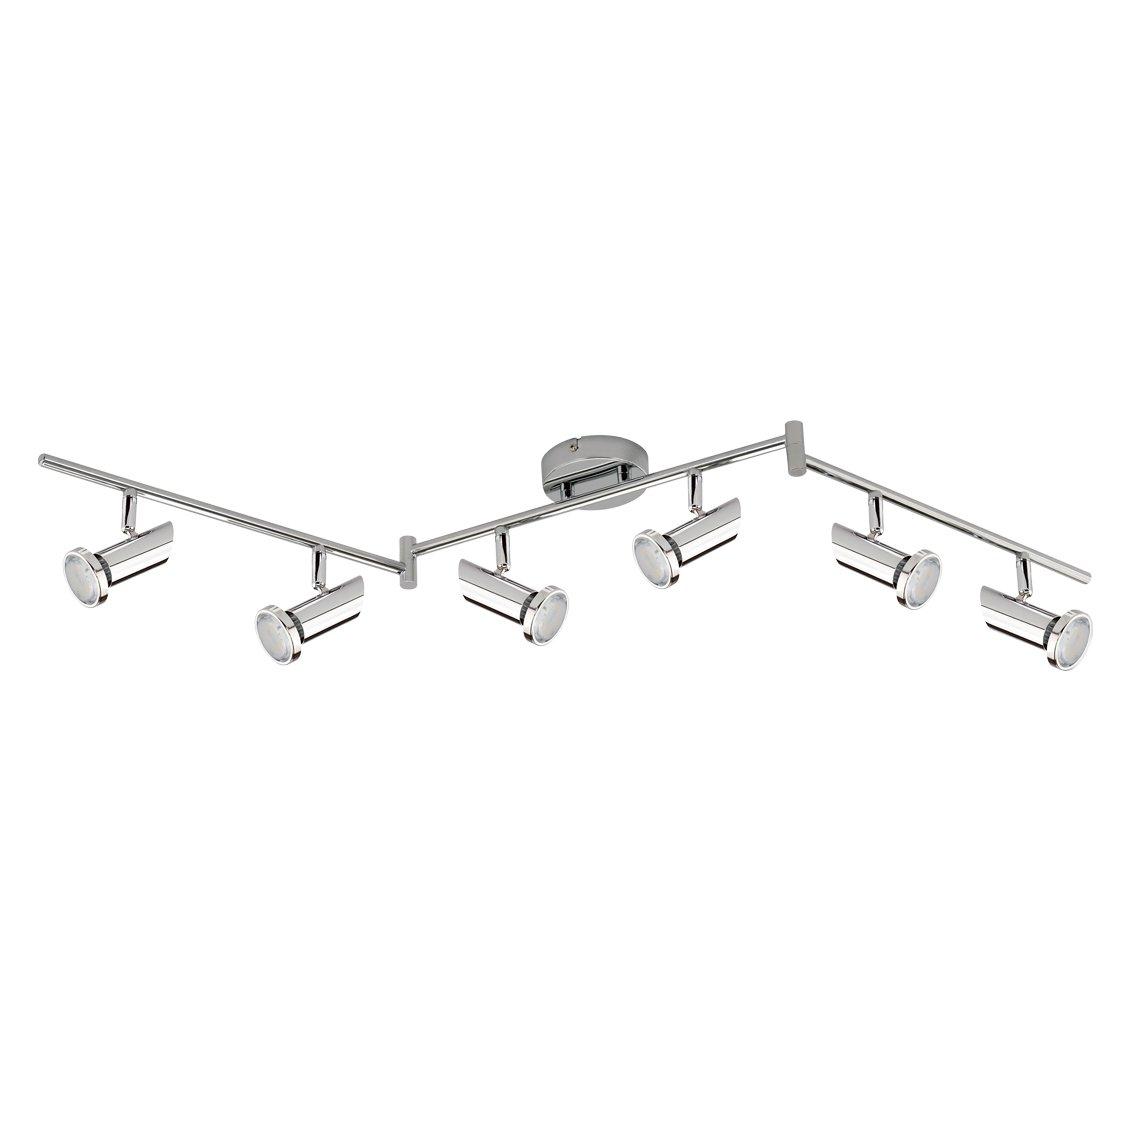 Trango 6-flg. LED Deckenleuchte inkl. 6x GU10 3000K warm-weiß LED Leuchtmittel direkt 230V TG2000-068